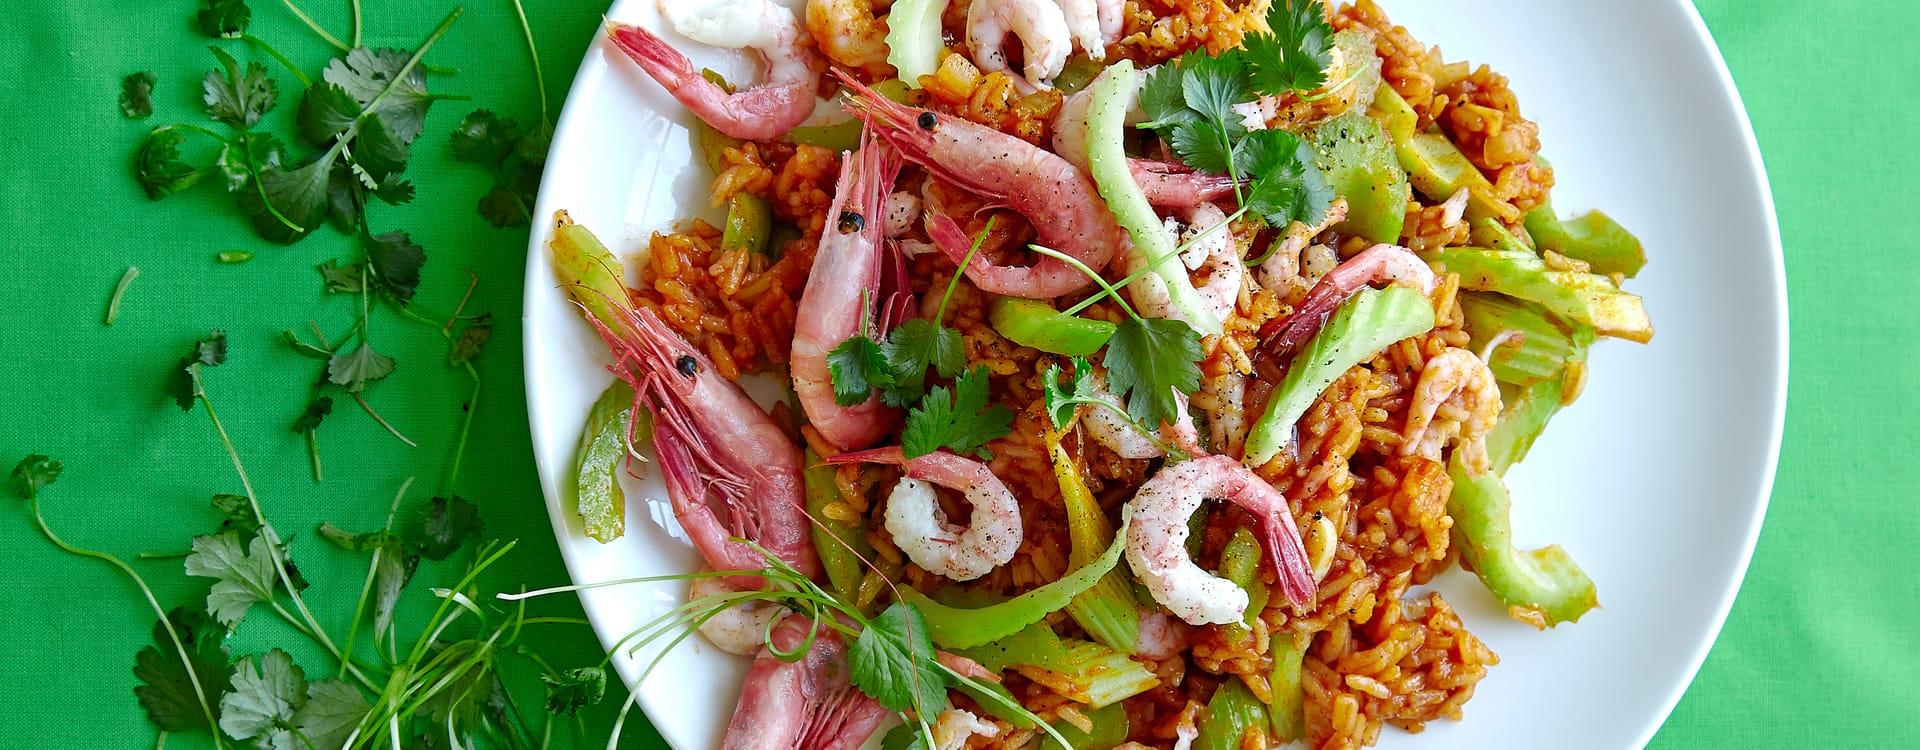 Krydret ris med reker og koriander